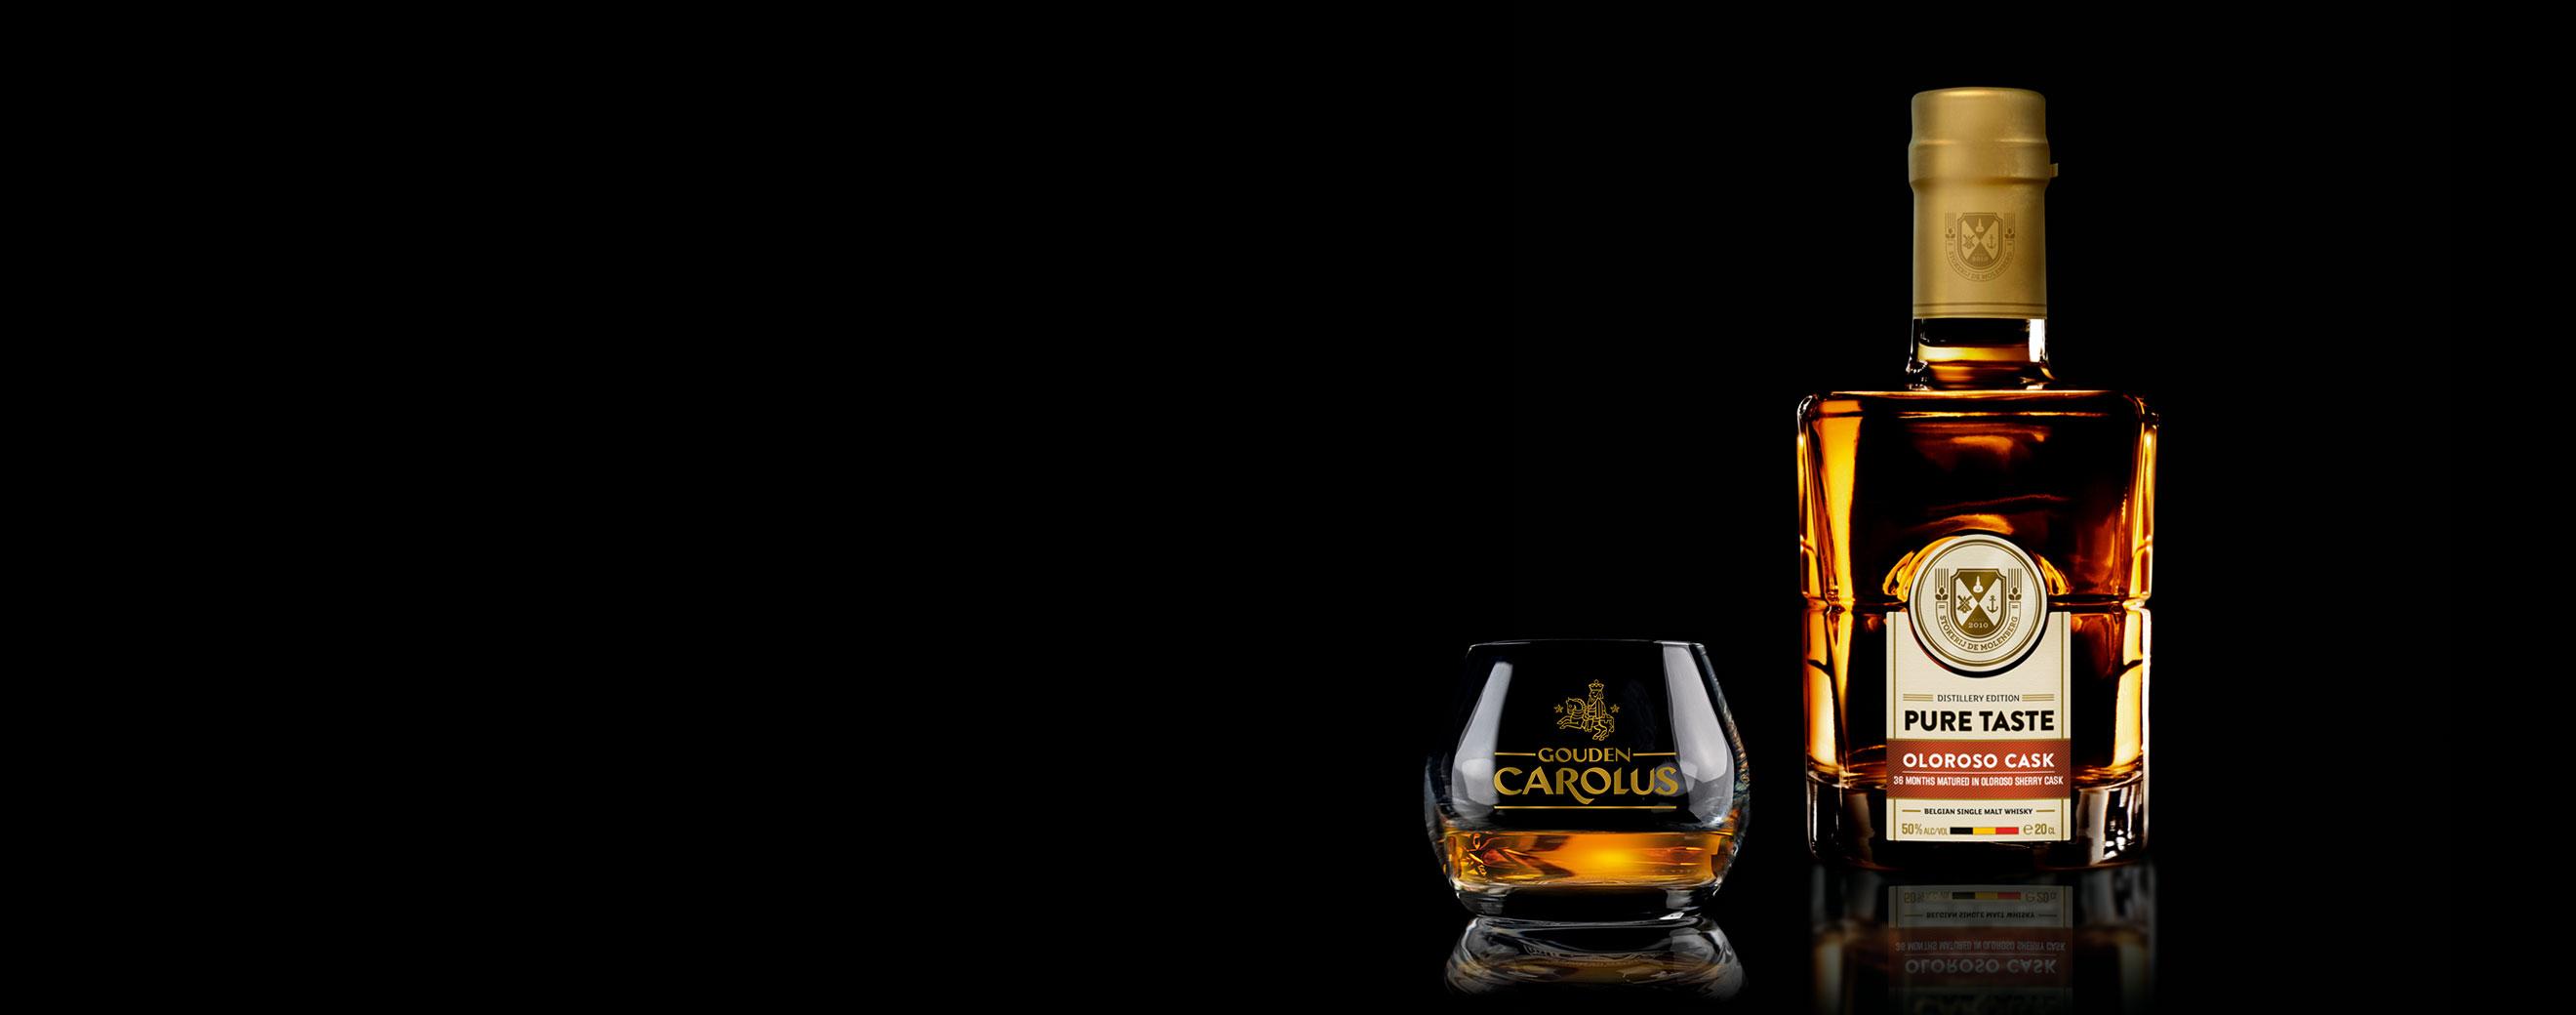 Pure Taste - Oloroso Cask Whisky Stokerij De Molenberg met glas